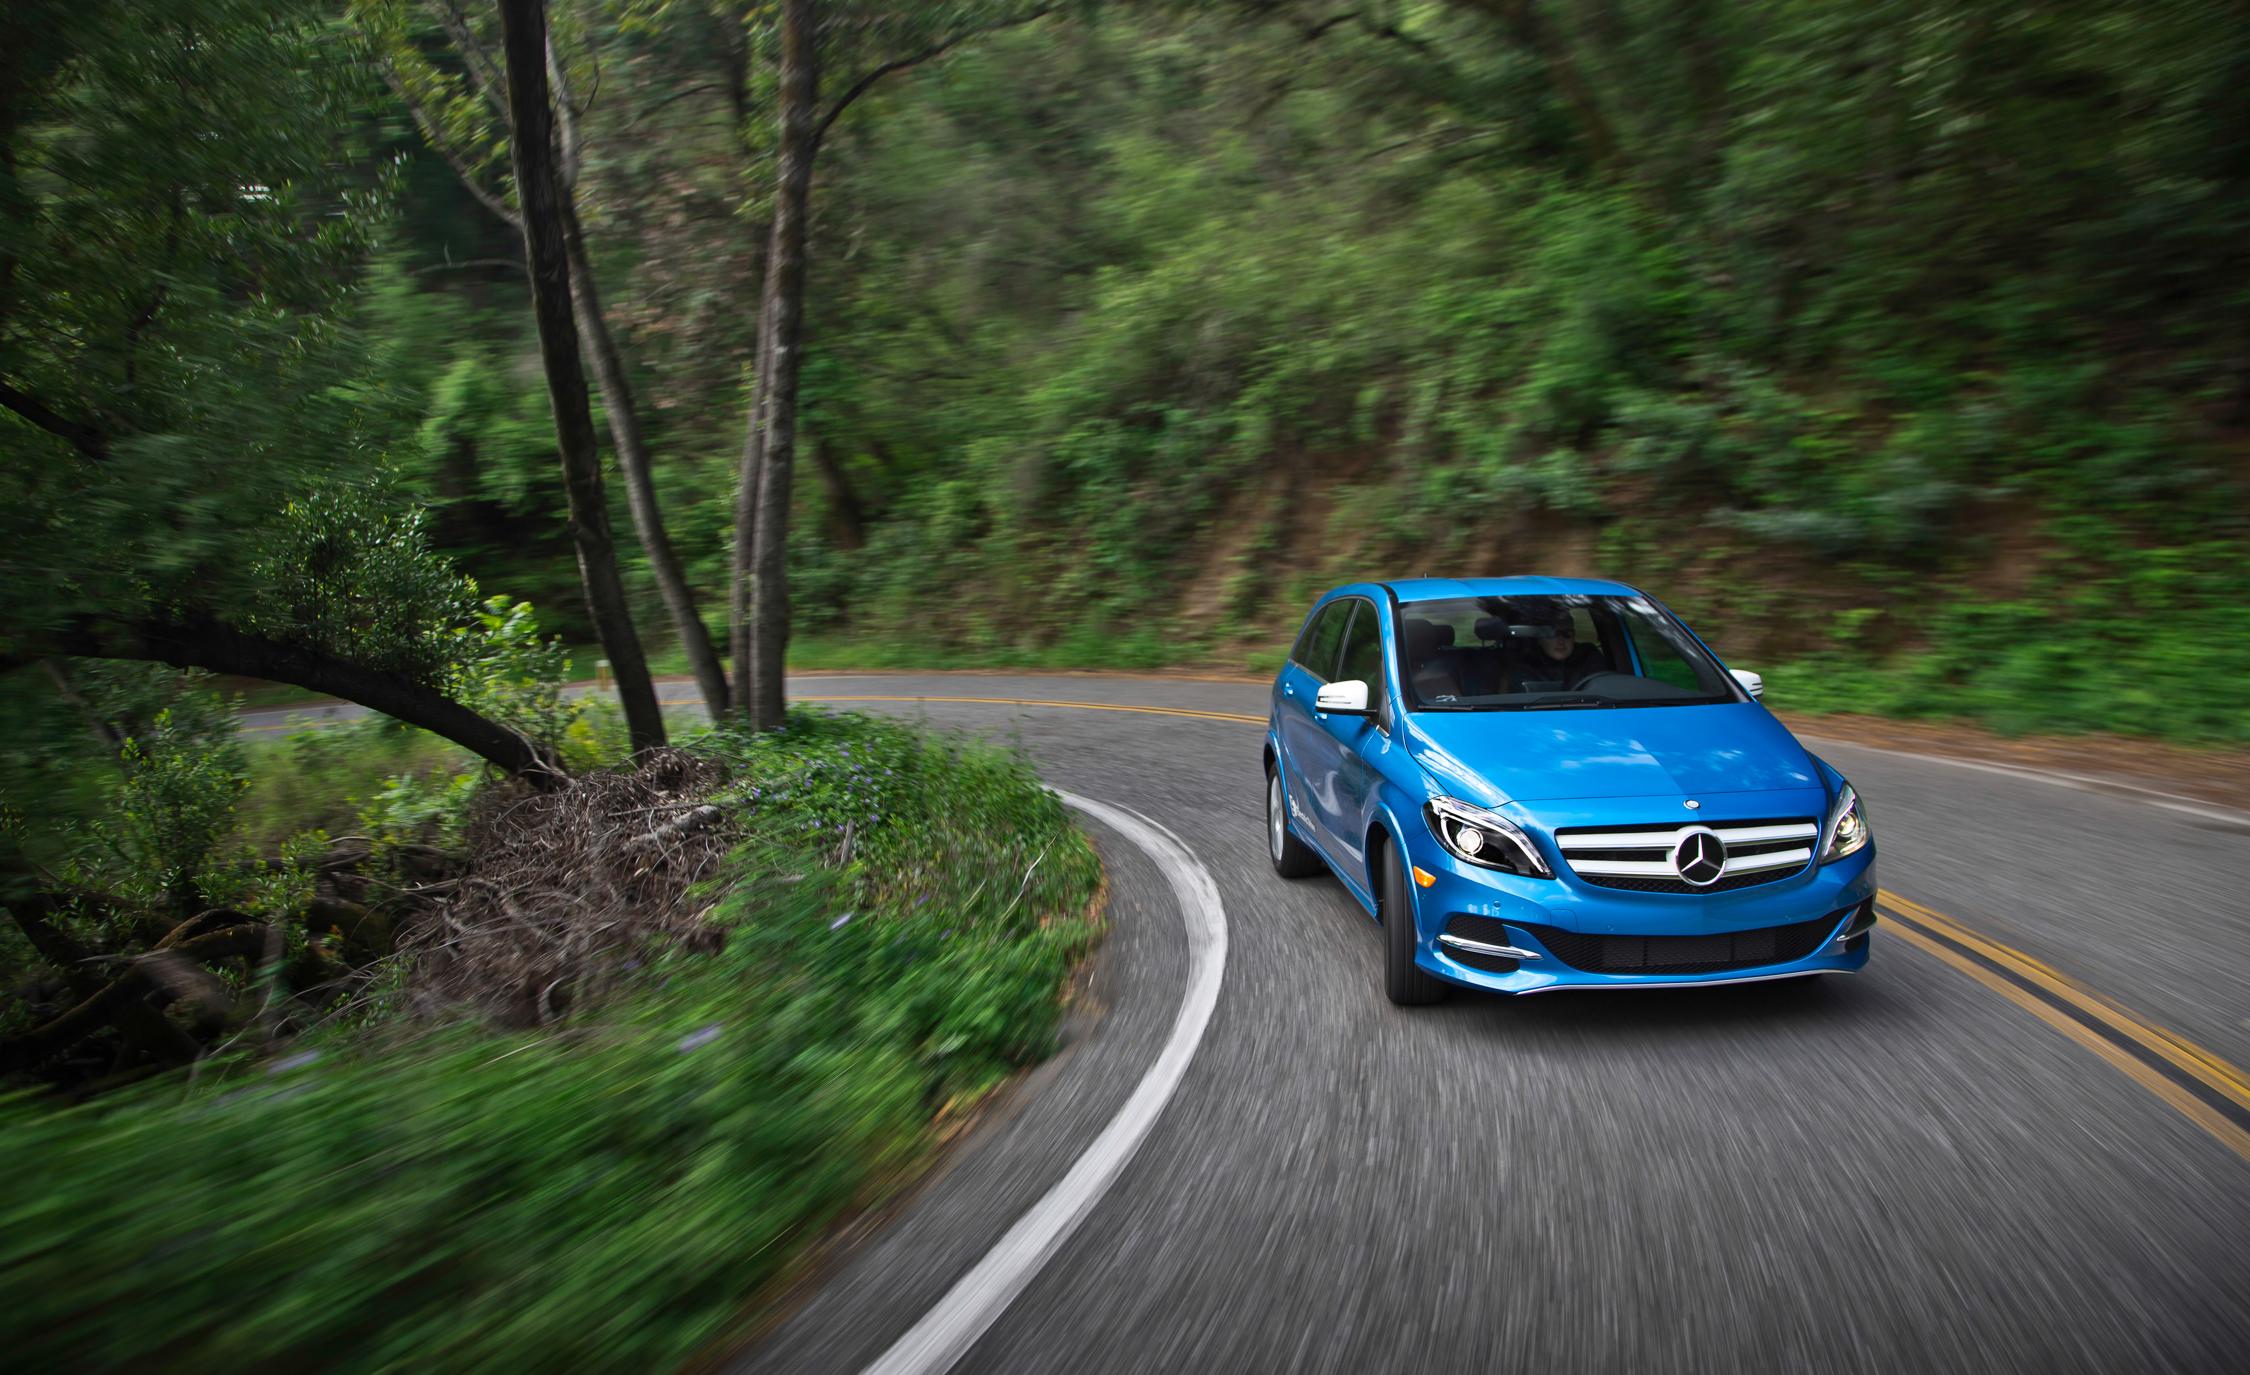 2014 Mercedes-Benz B-class Electric Drive Cornering